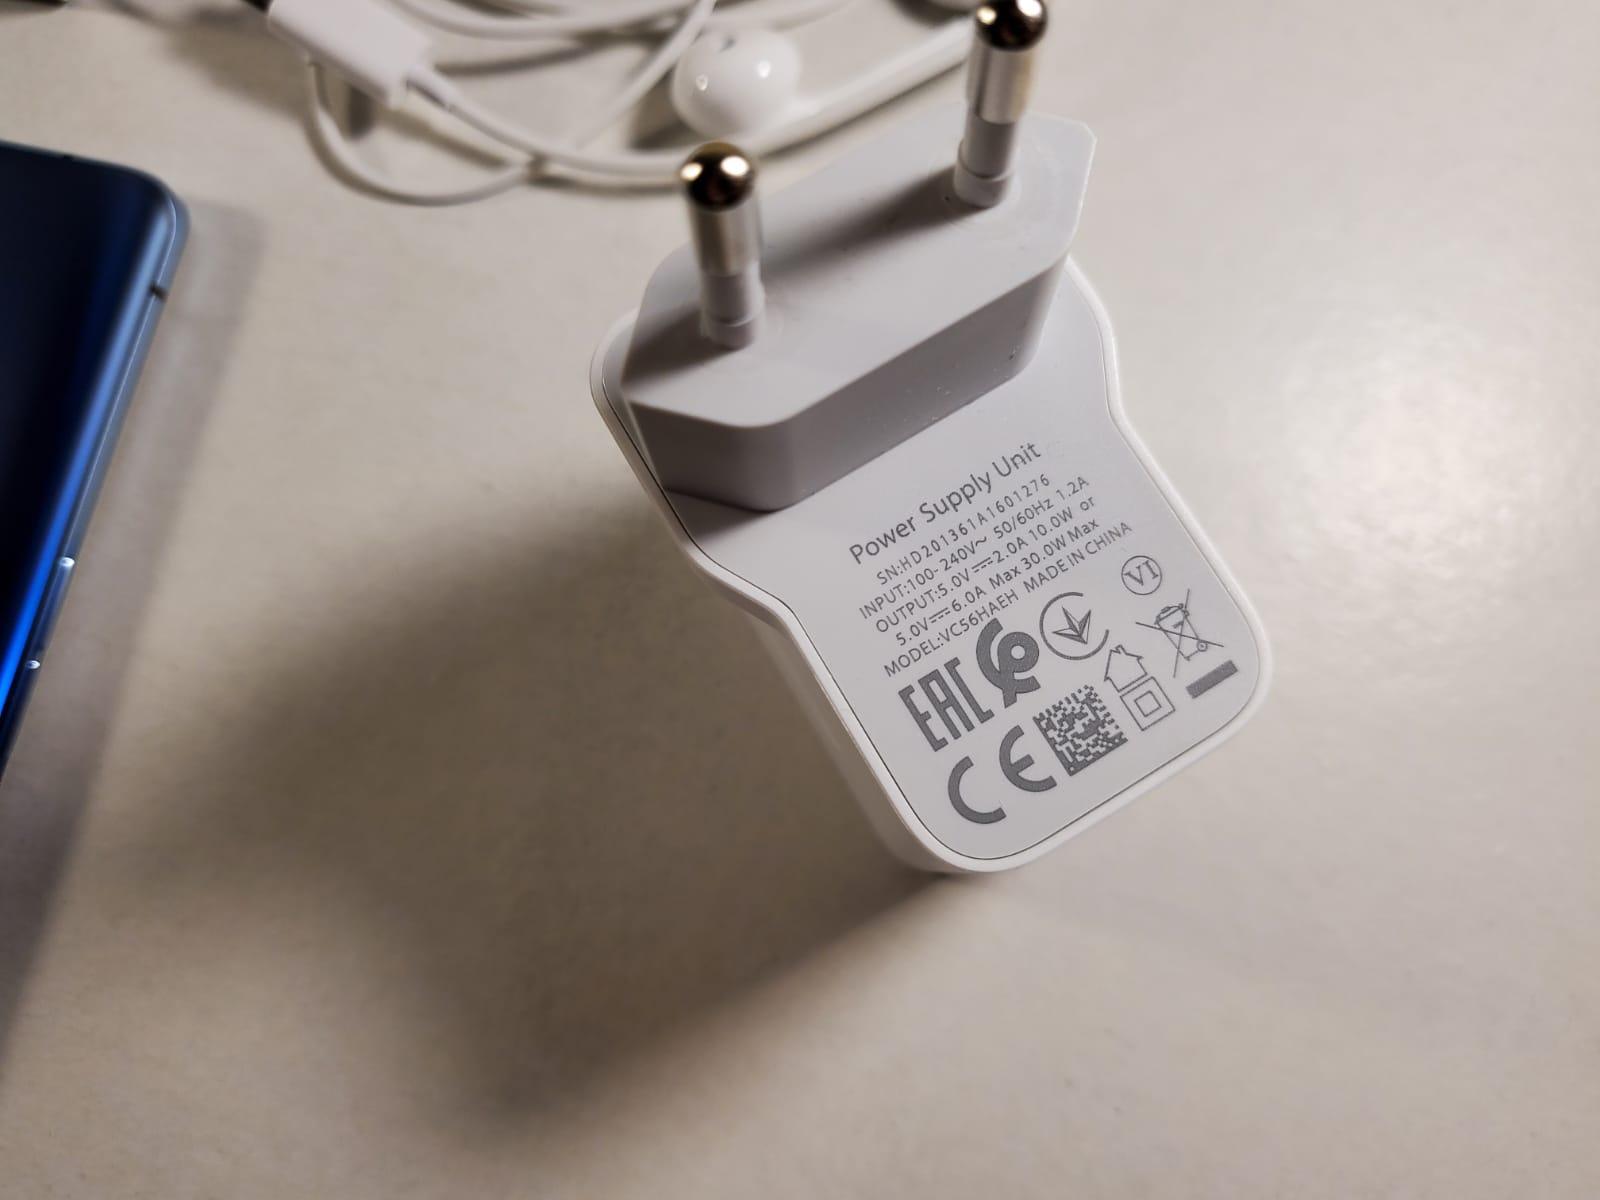 Unboxing și primele impresii Oppo Reno 3 Pro 5G 5